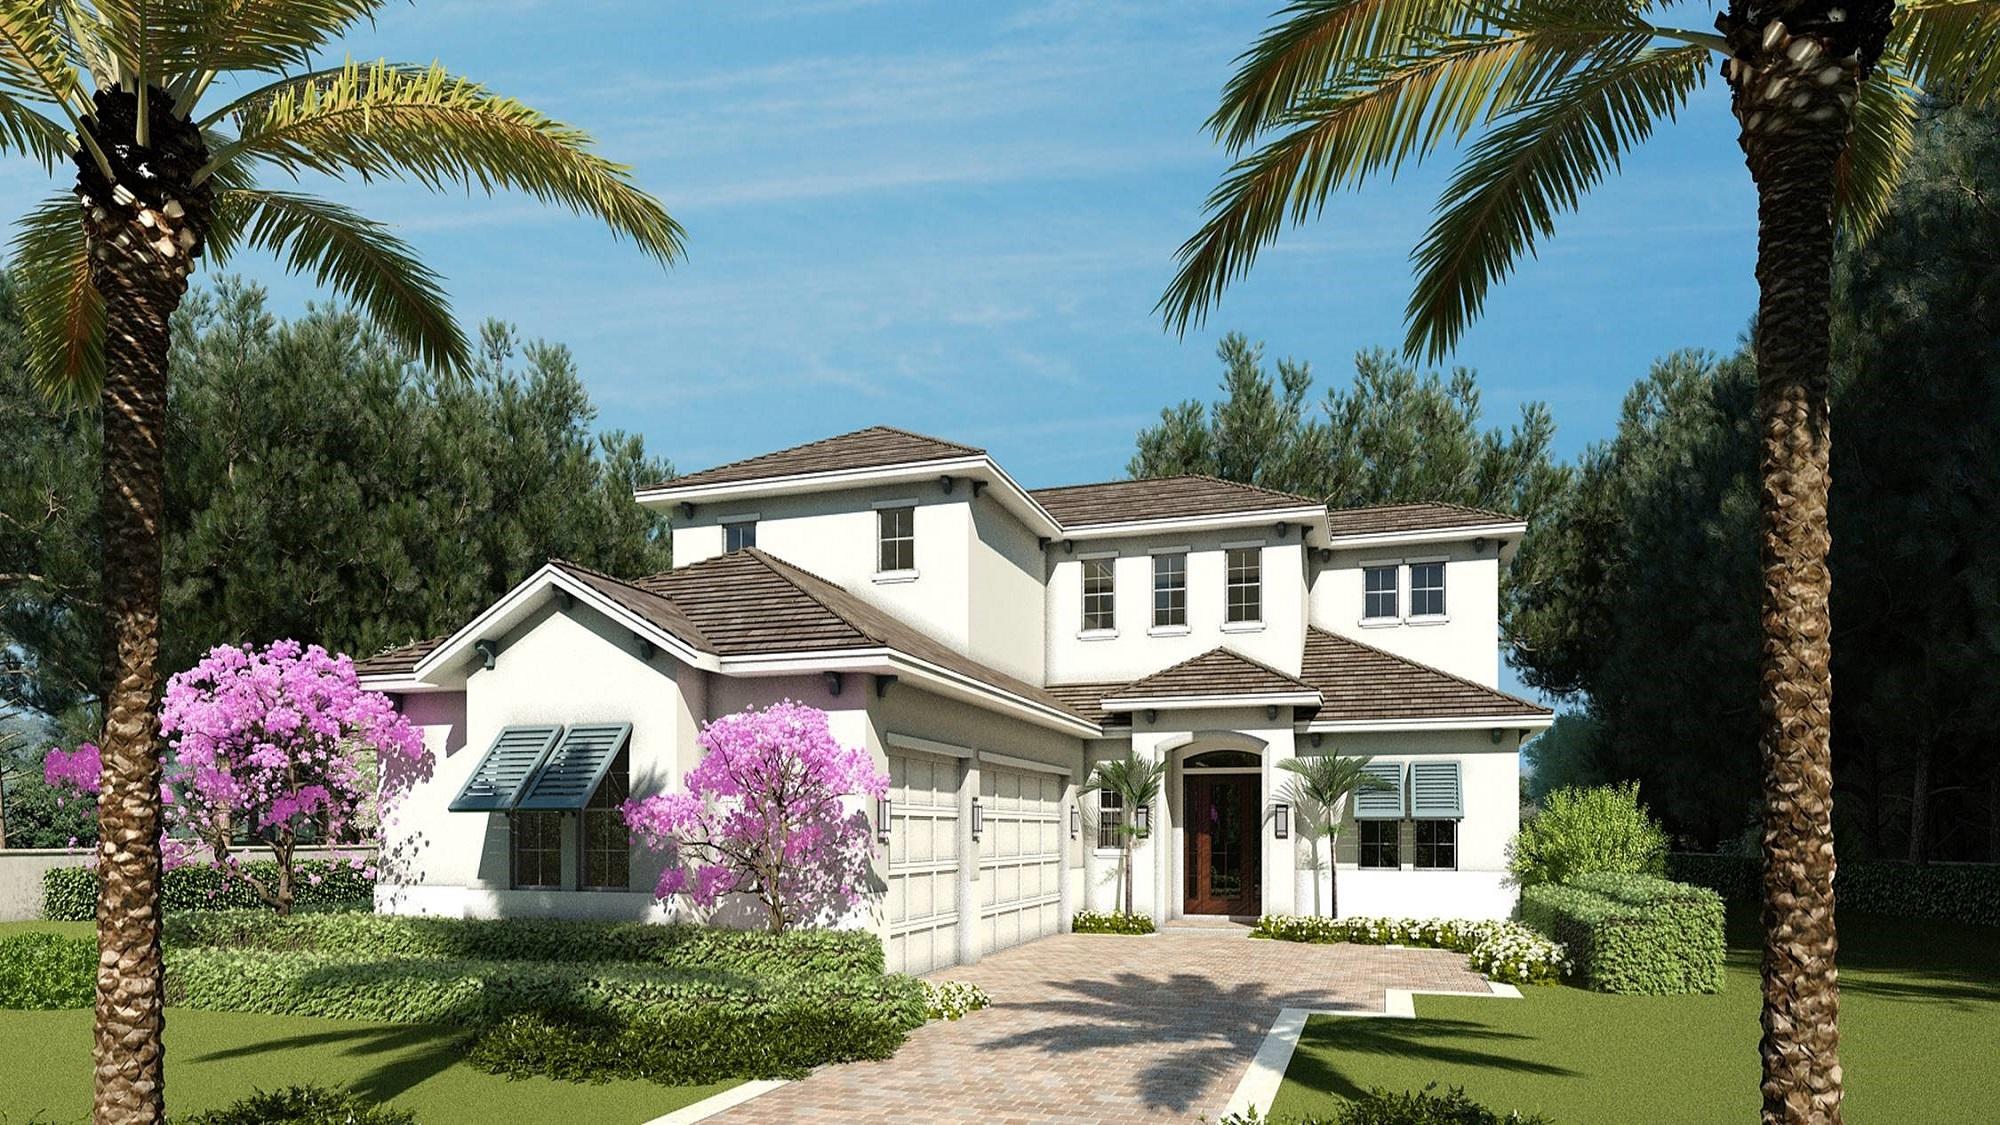 The Aruba | 1618 Bay Road, Sarasota, FL 34231 $1,379,000 | 4 Bedrooms | 3 Full Bathrooms | 1 Half Bathroom | Study | Bonus Room | Pool and Spa